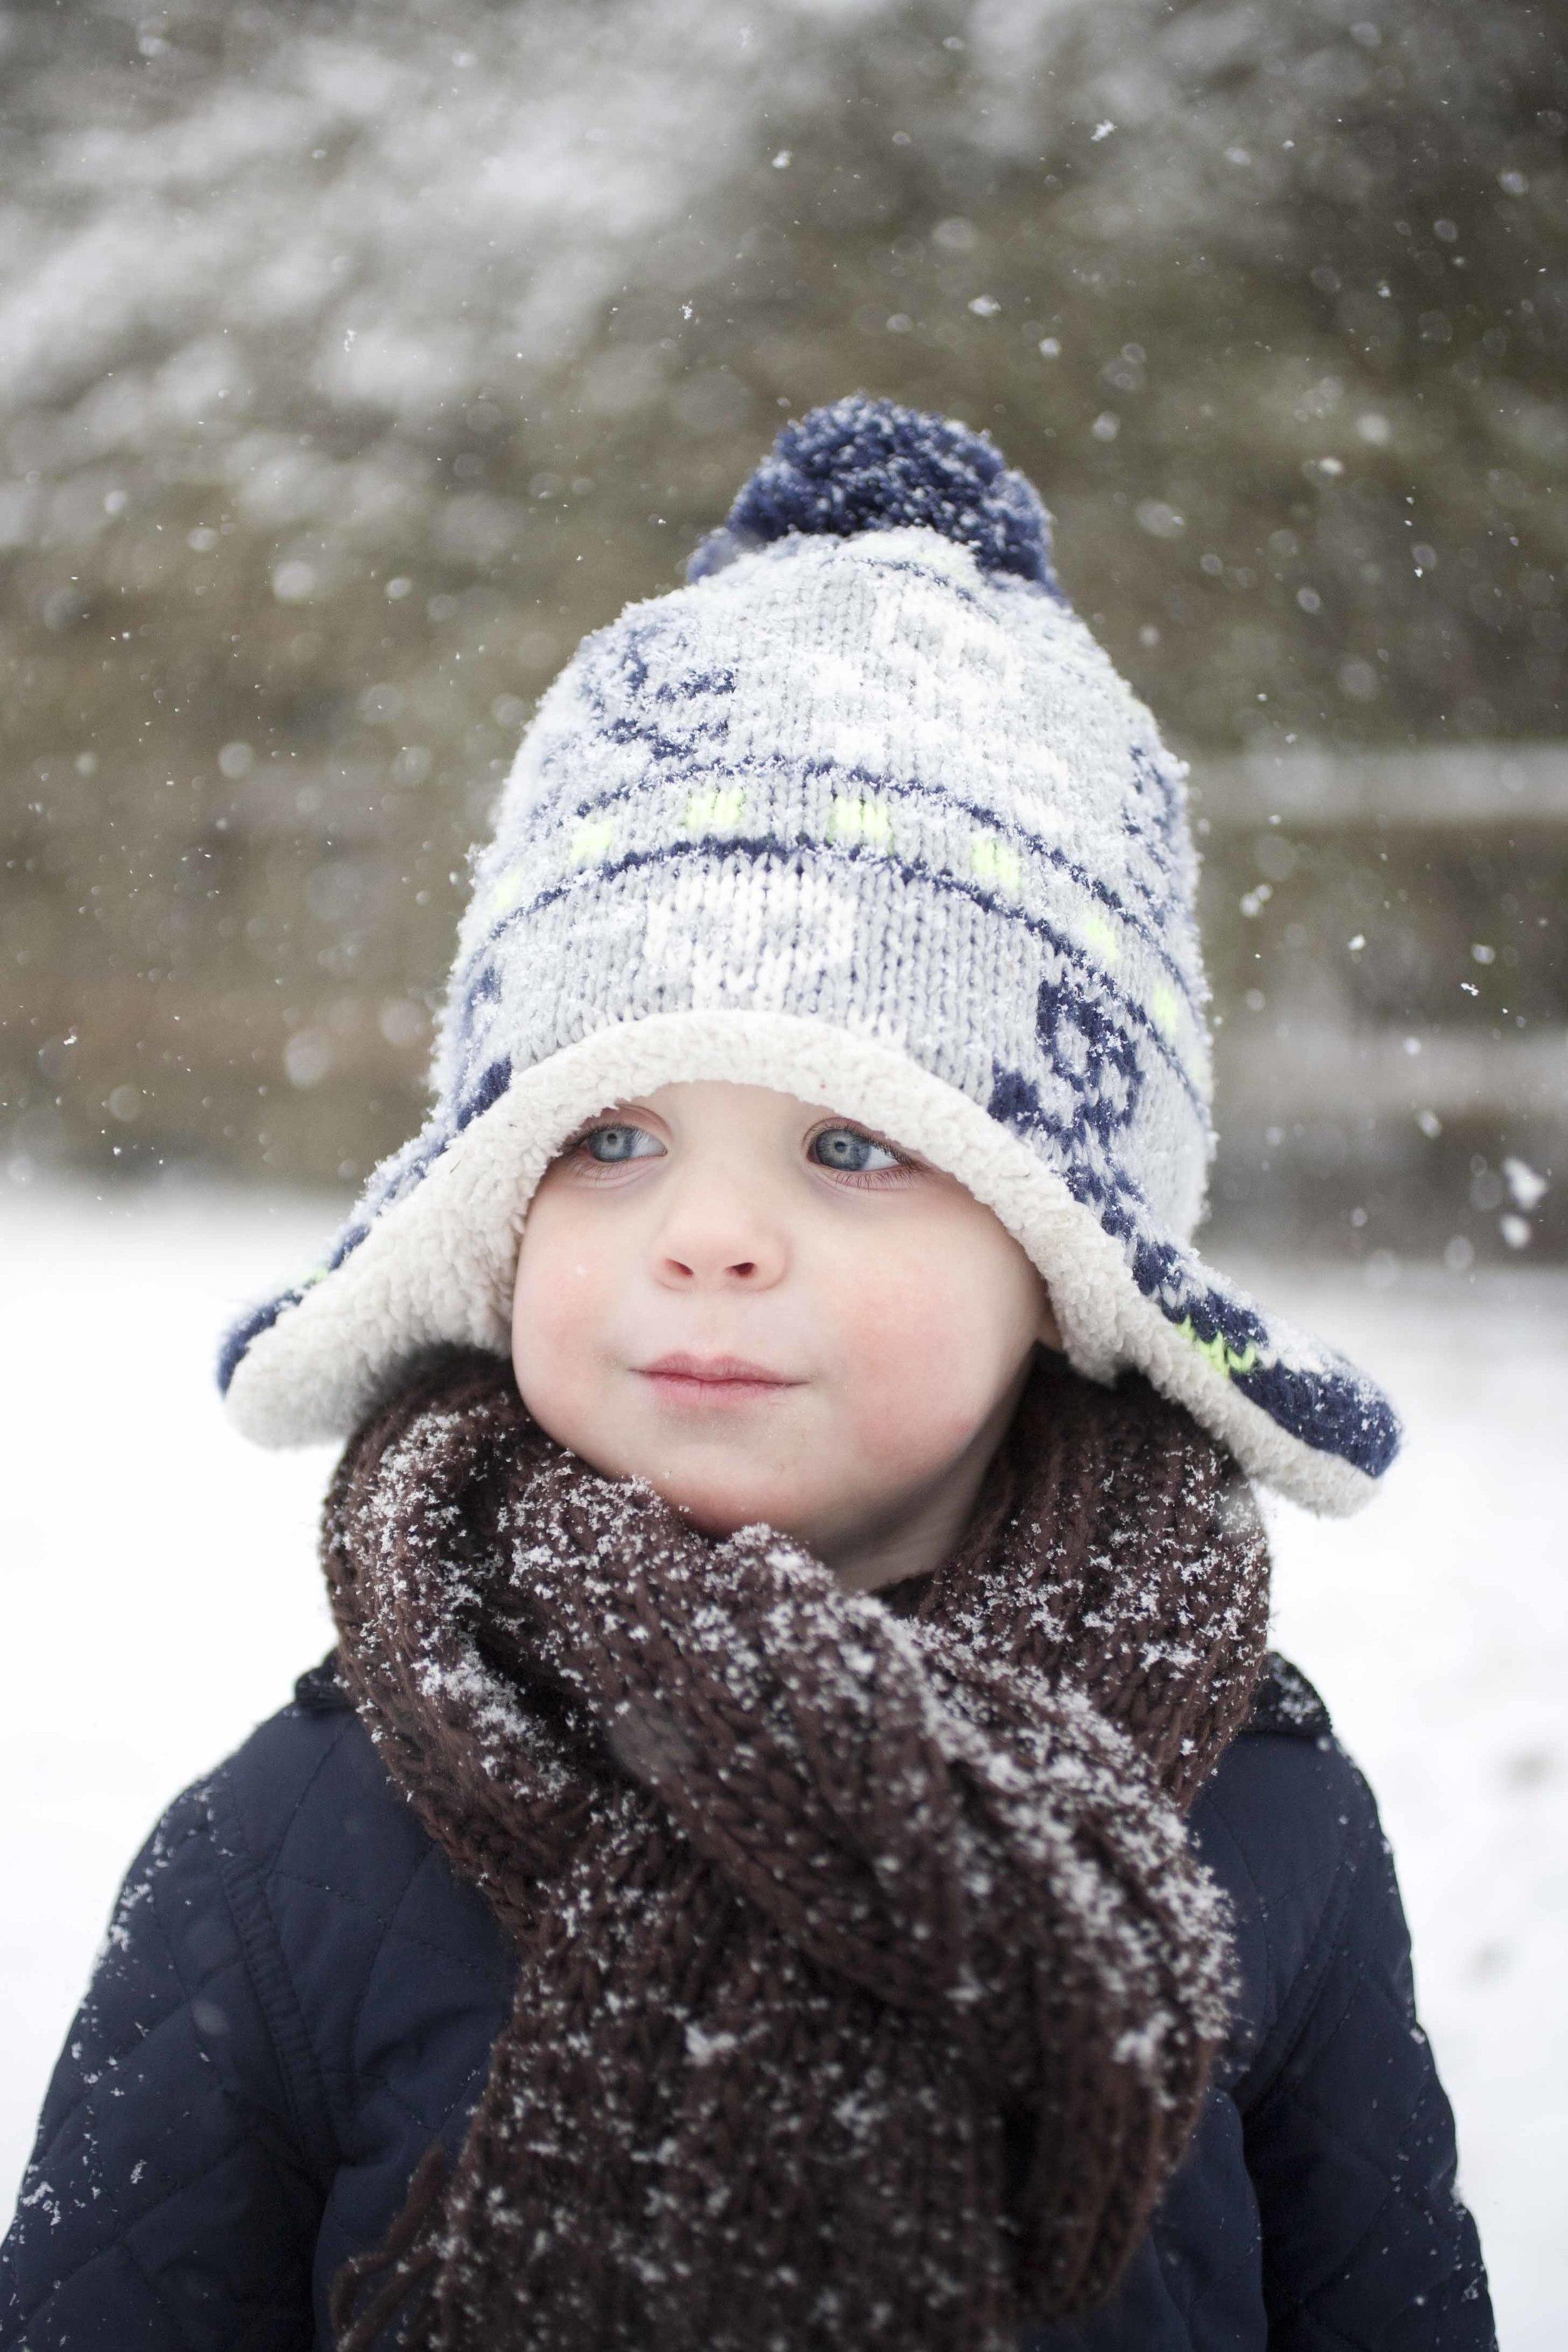 SNOW DAY ARIANA CLARE_1.jpg